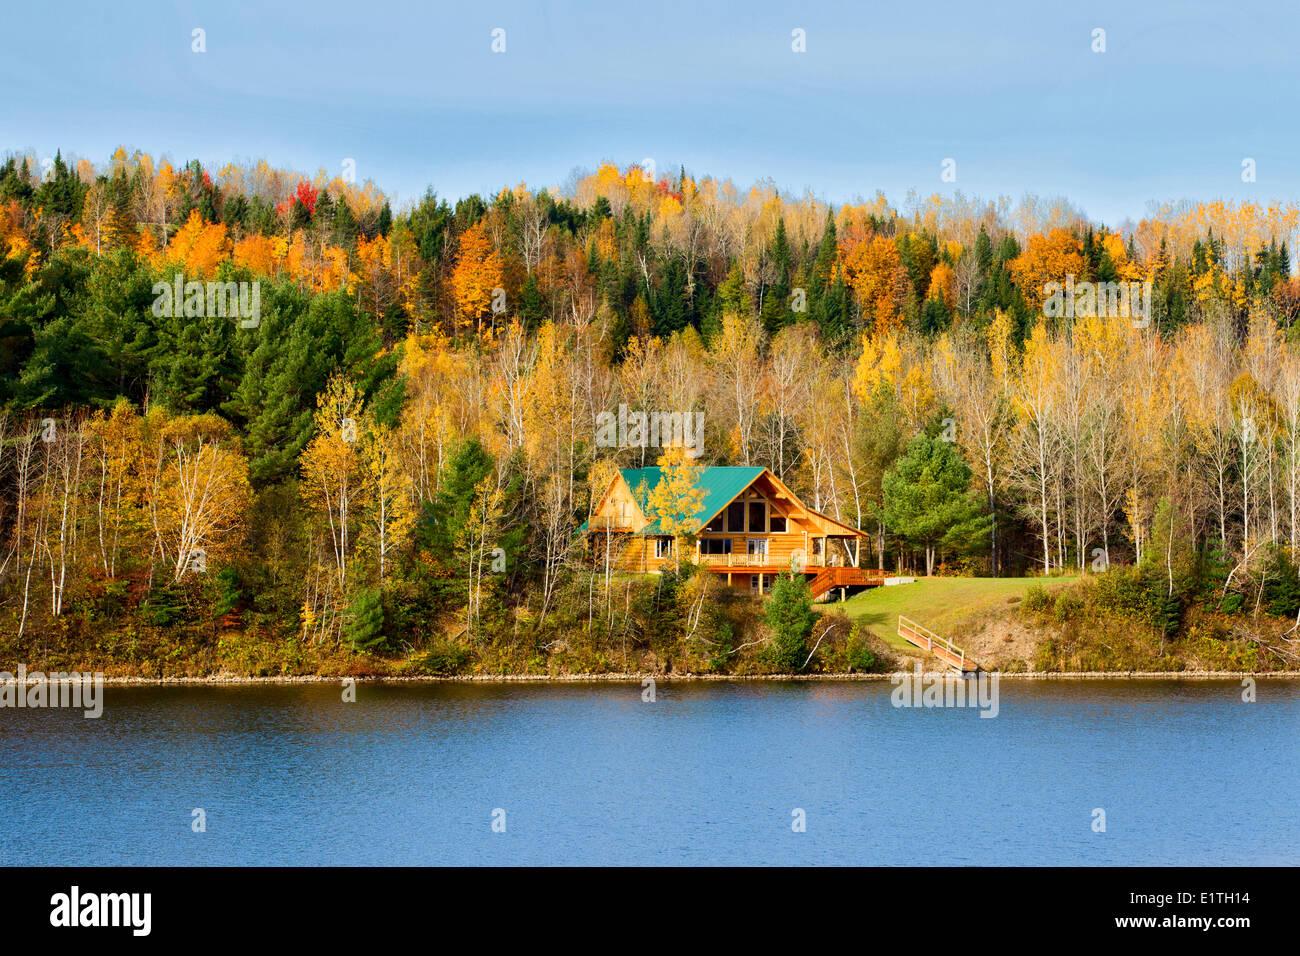 Log house, Upper Kent, Saint John River Valley, New Brunswick, Canada - Stock Image